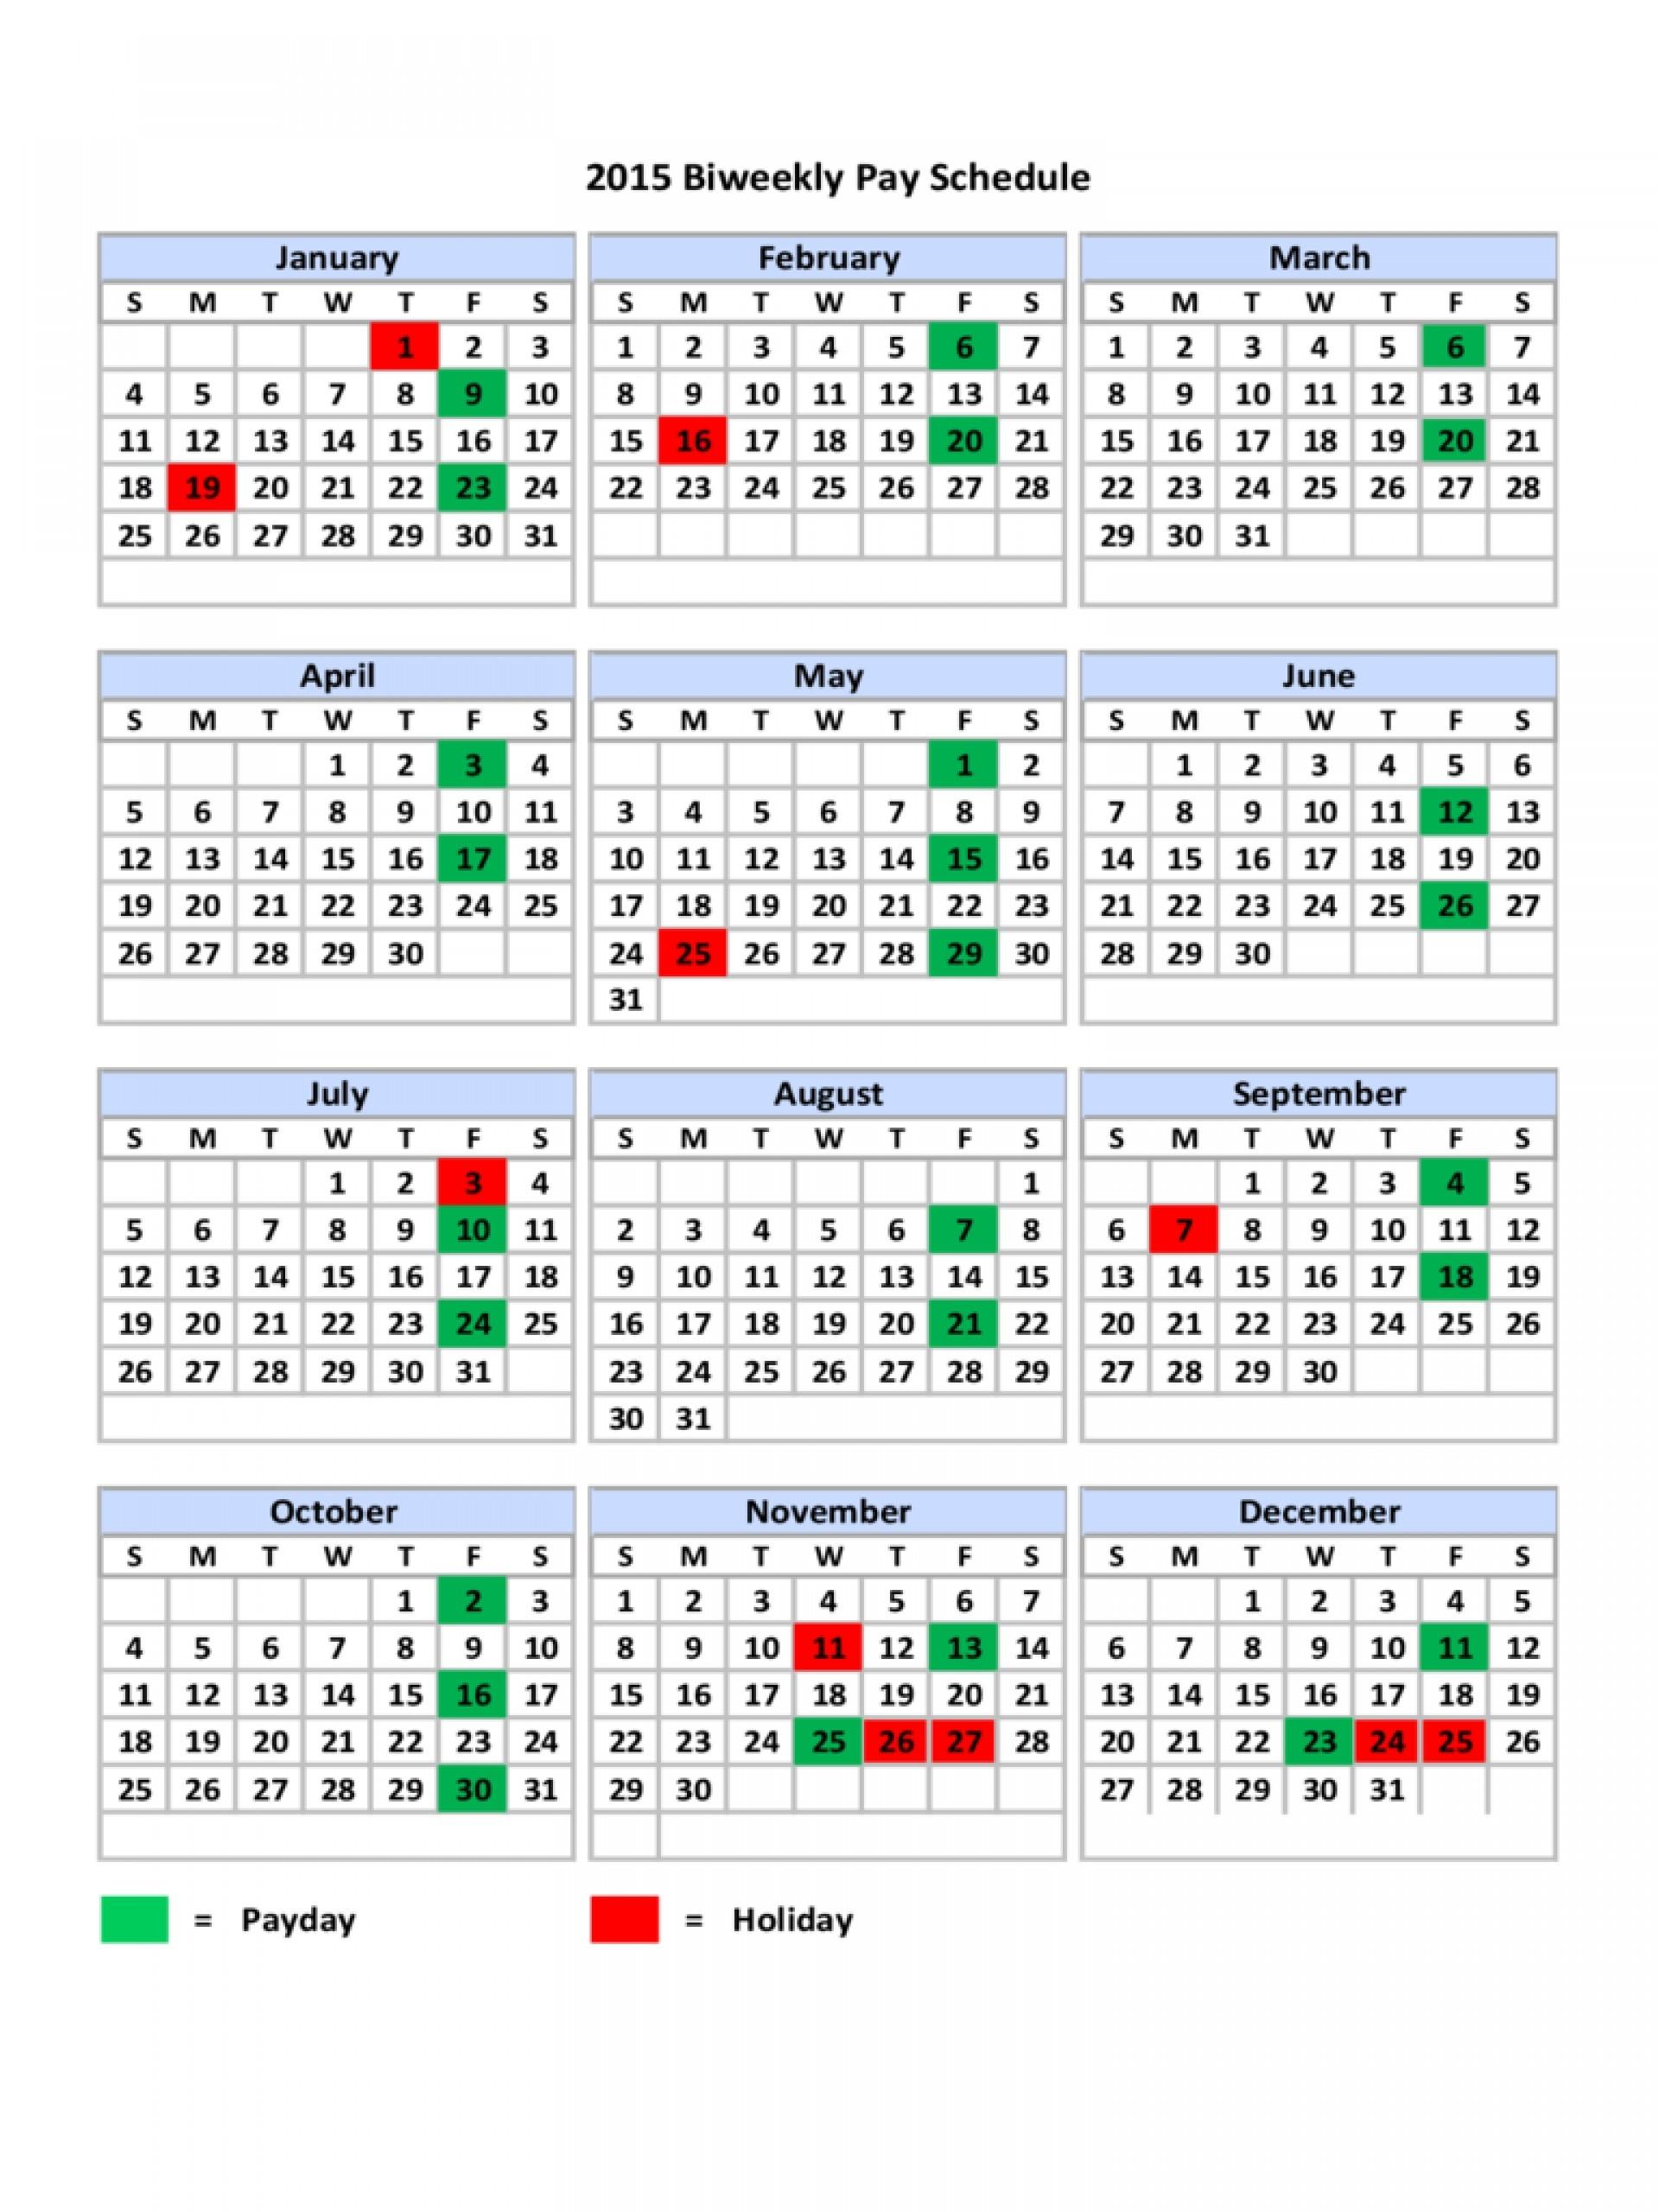 2018 Biweekly Payroll Calendar Excel | Payroll Calendars 2020